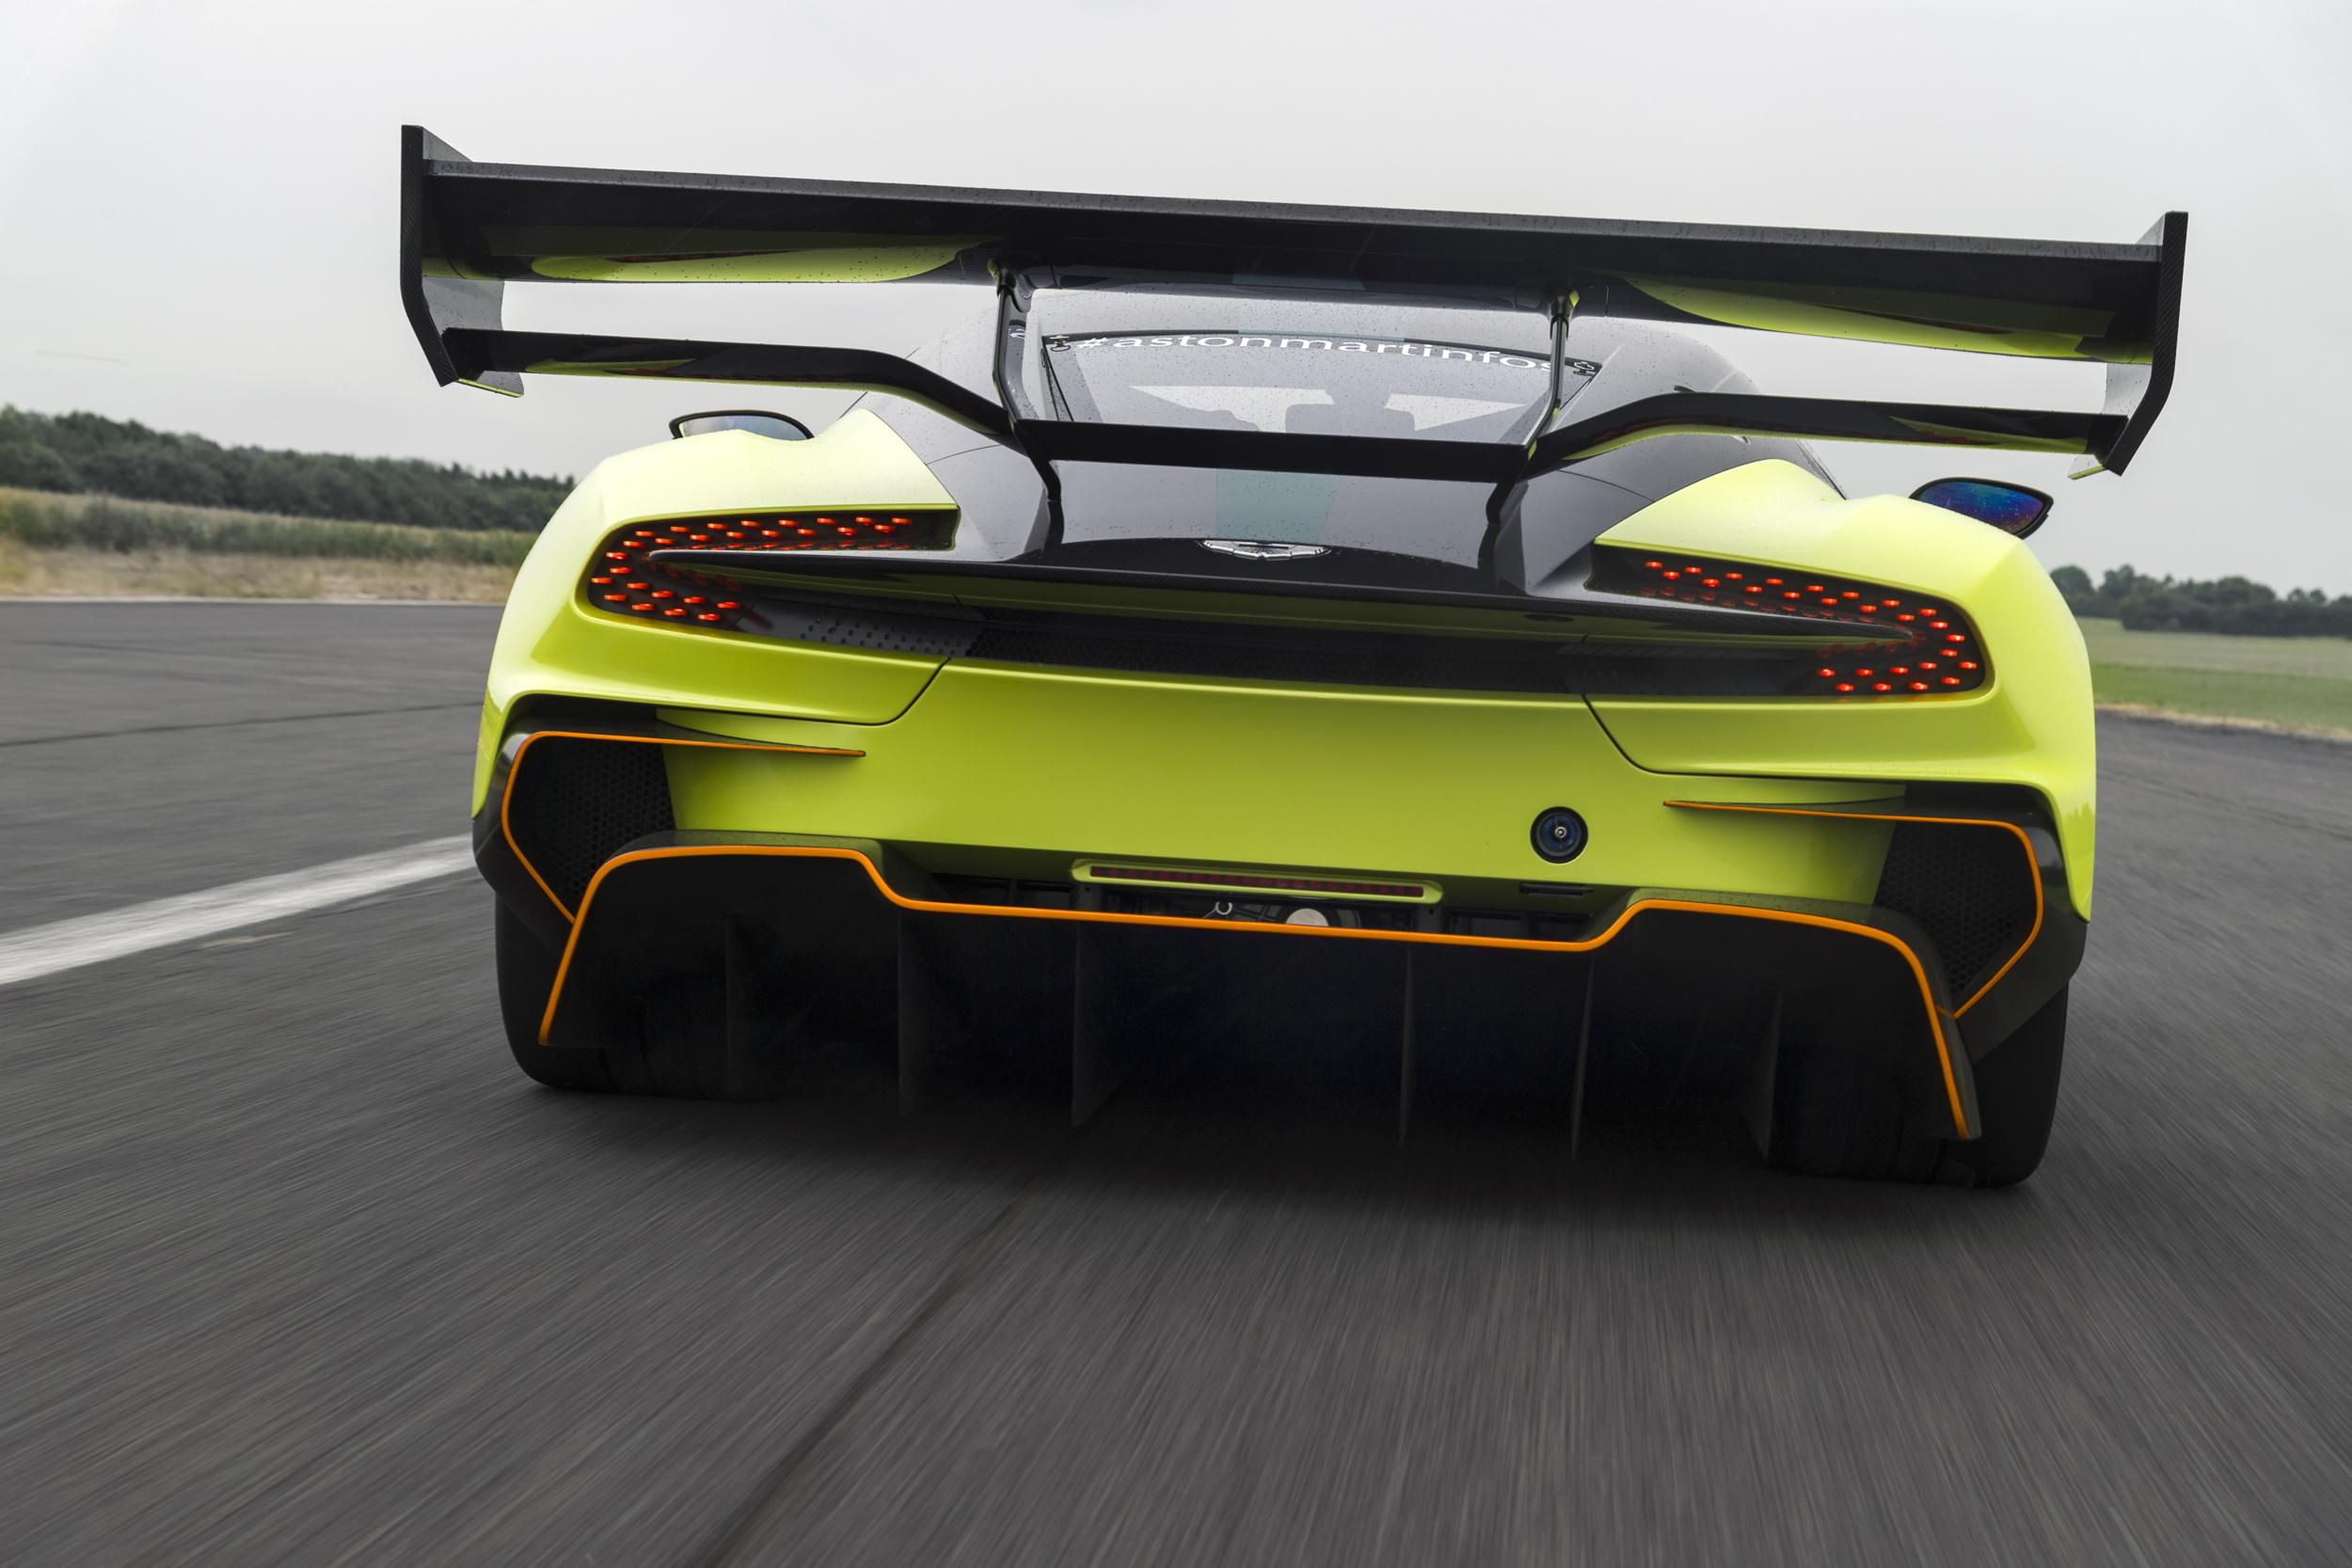 Aston Martin Vulcan AMR Pro rear driving